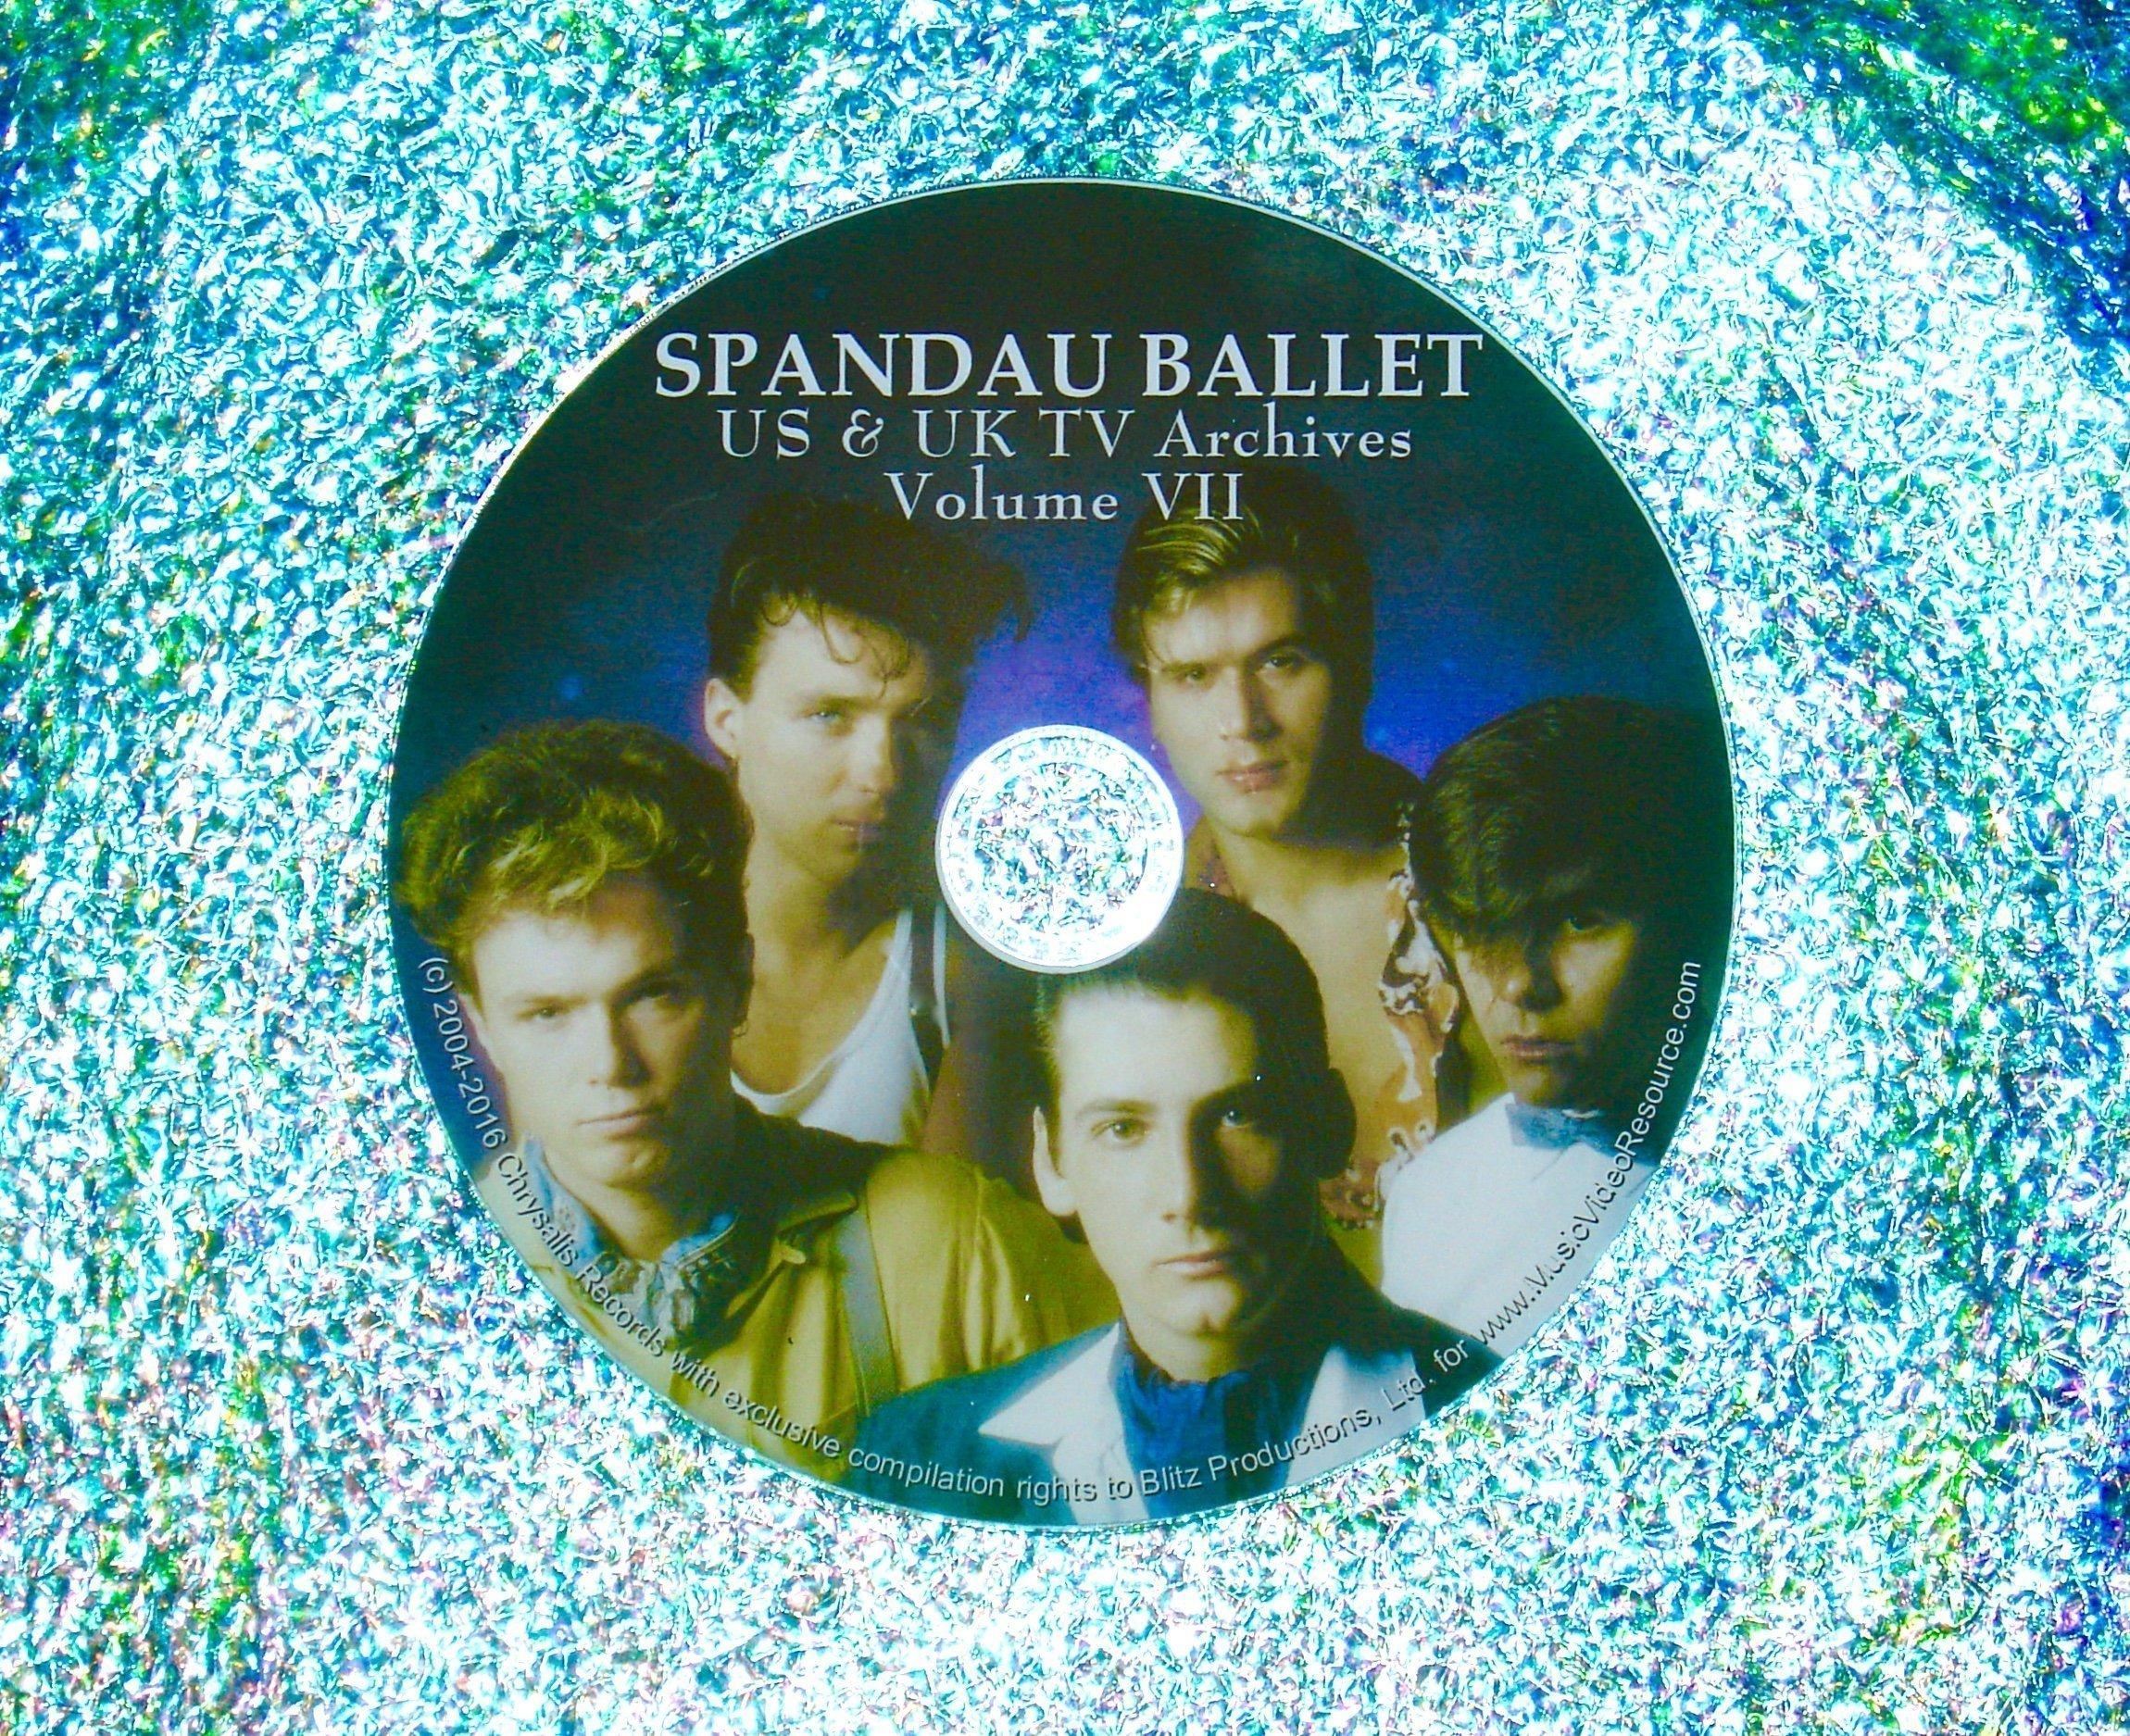 SPANDAU BALLET Video Archives 1981-2000 VOLUME VII